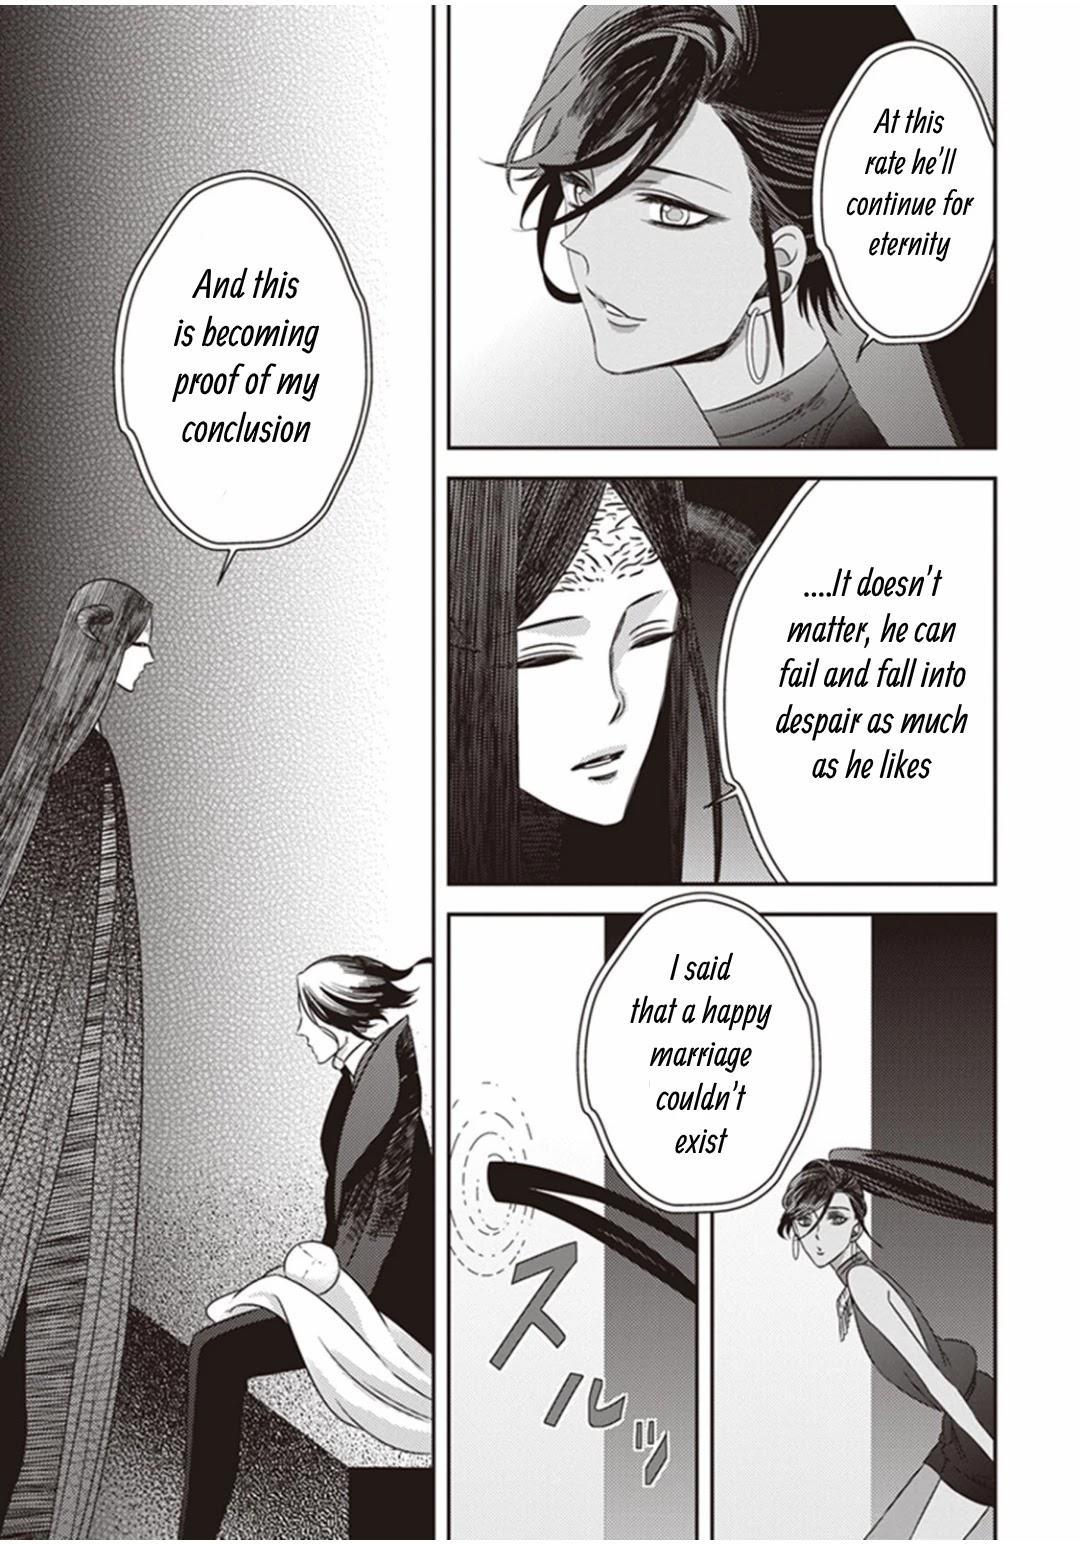 Midnight Occult Civil Servants Chapter 11.2: Demon And Sense Of Loss (Part 4) page 20 - Mangakakalots.com